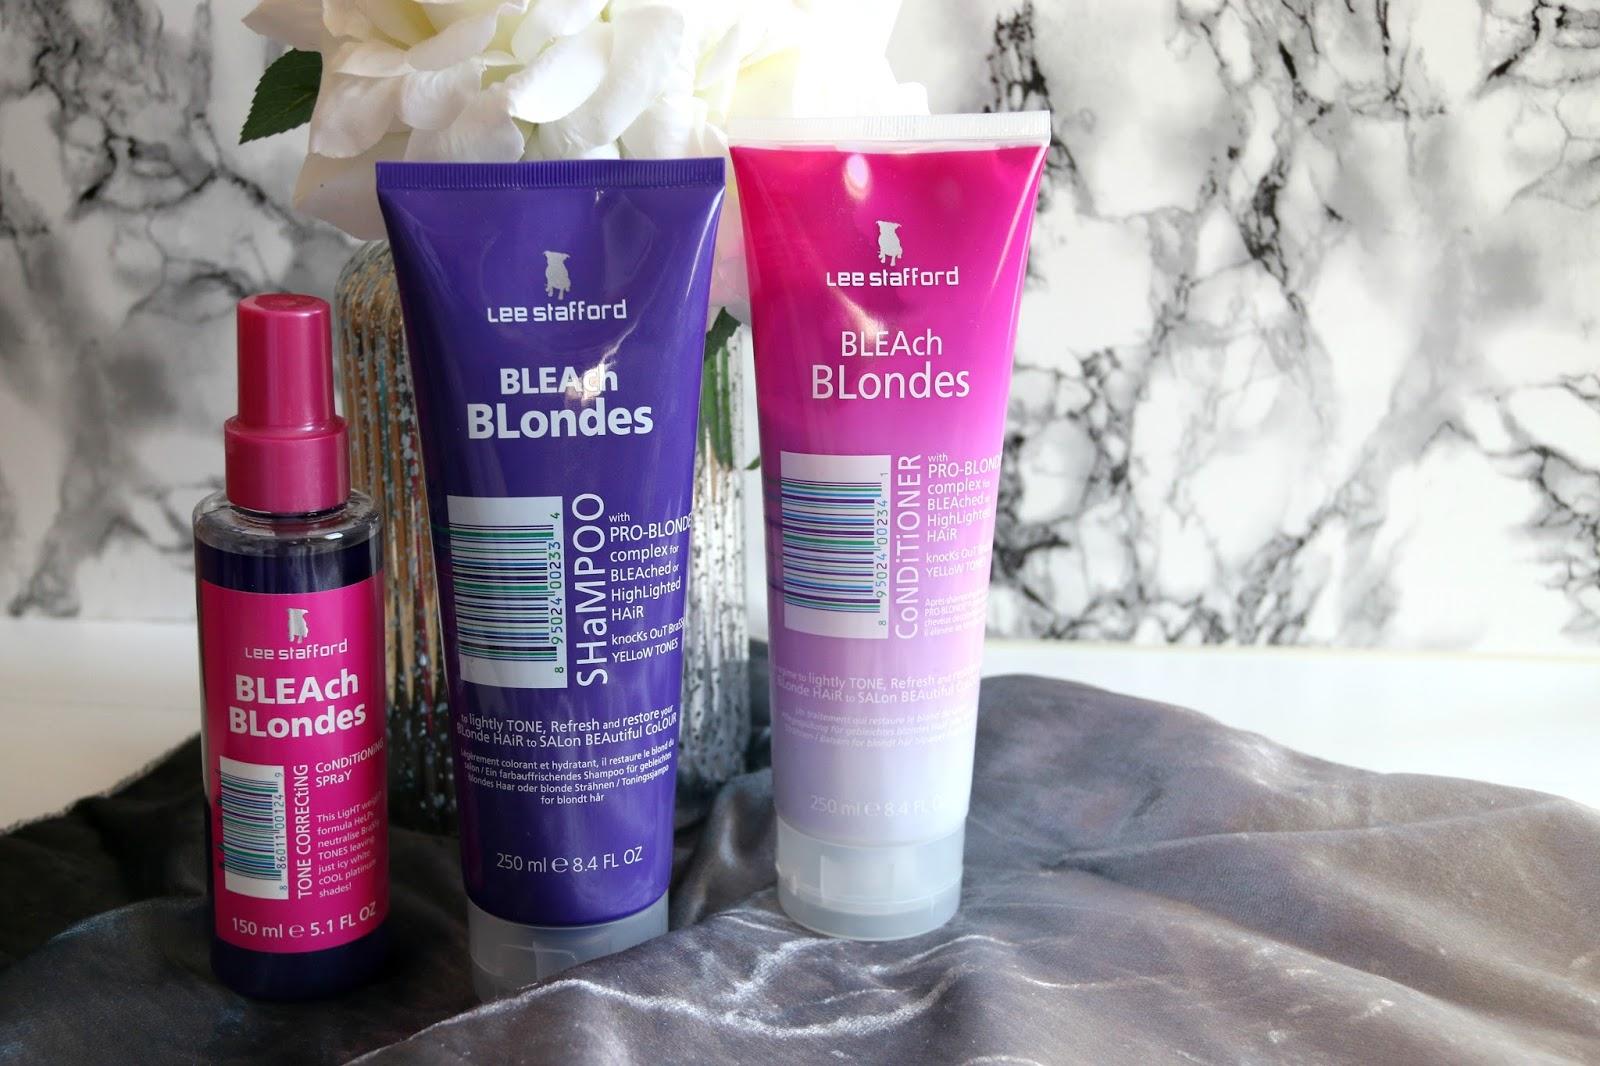 Lee Stafford Bleach BLEAch BLondes Hair Care Review WhatLauraLoves UK Beauty Blogger